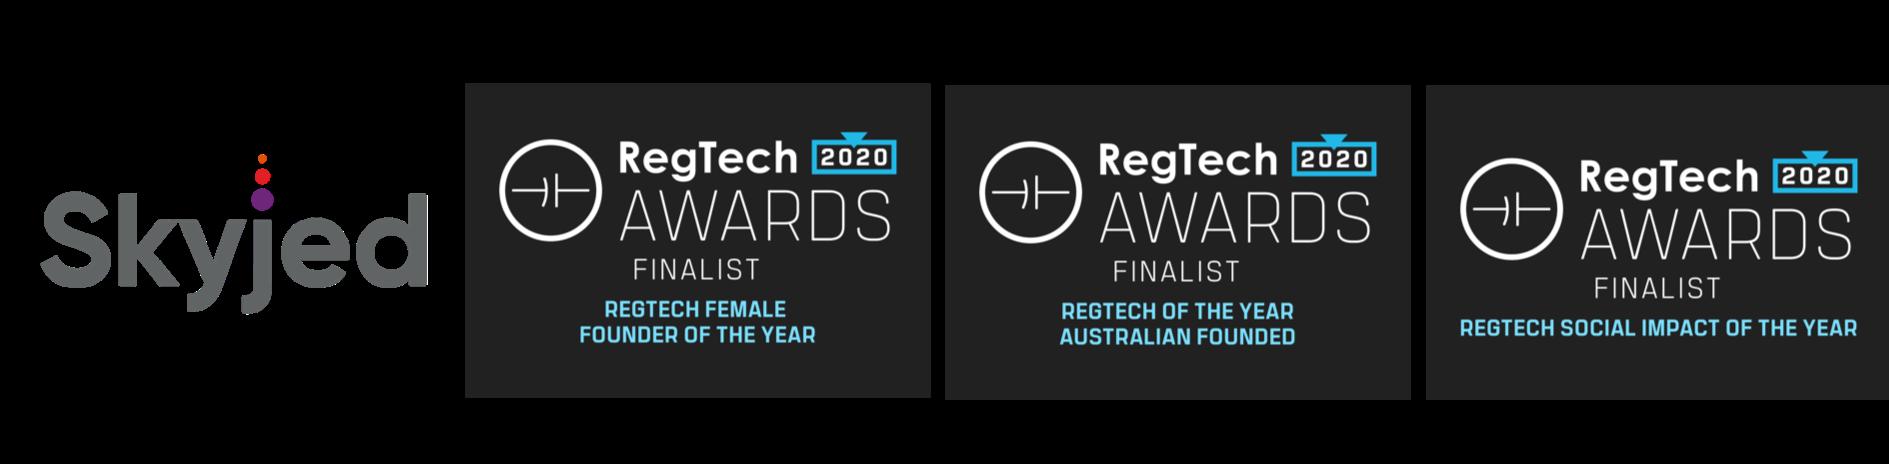 Skyjed - Regtech 2020 Awards Finalist